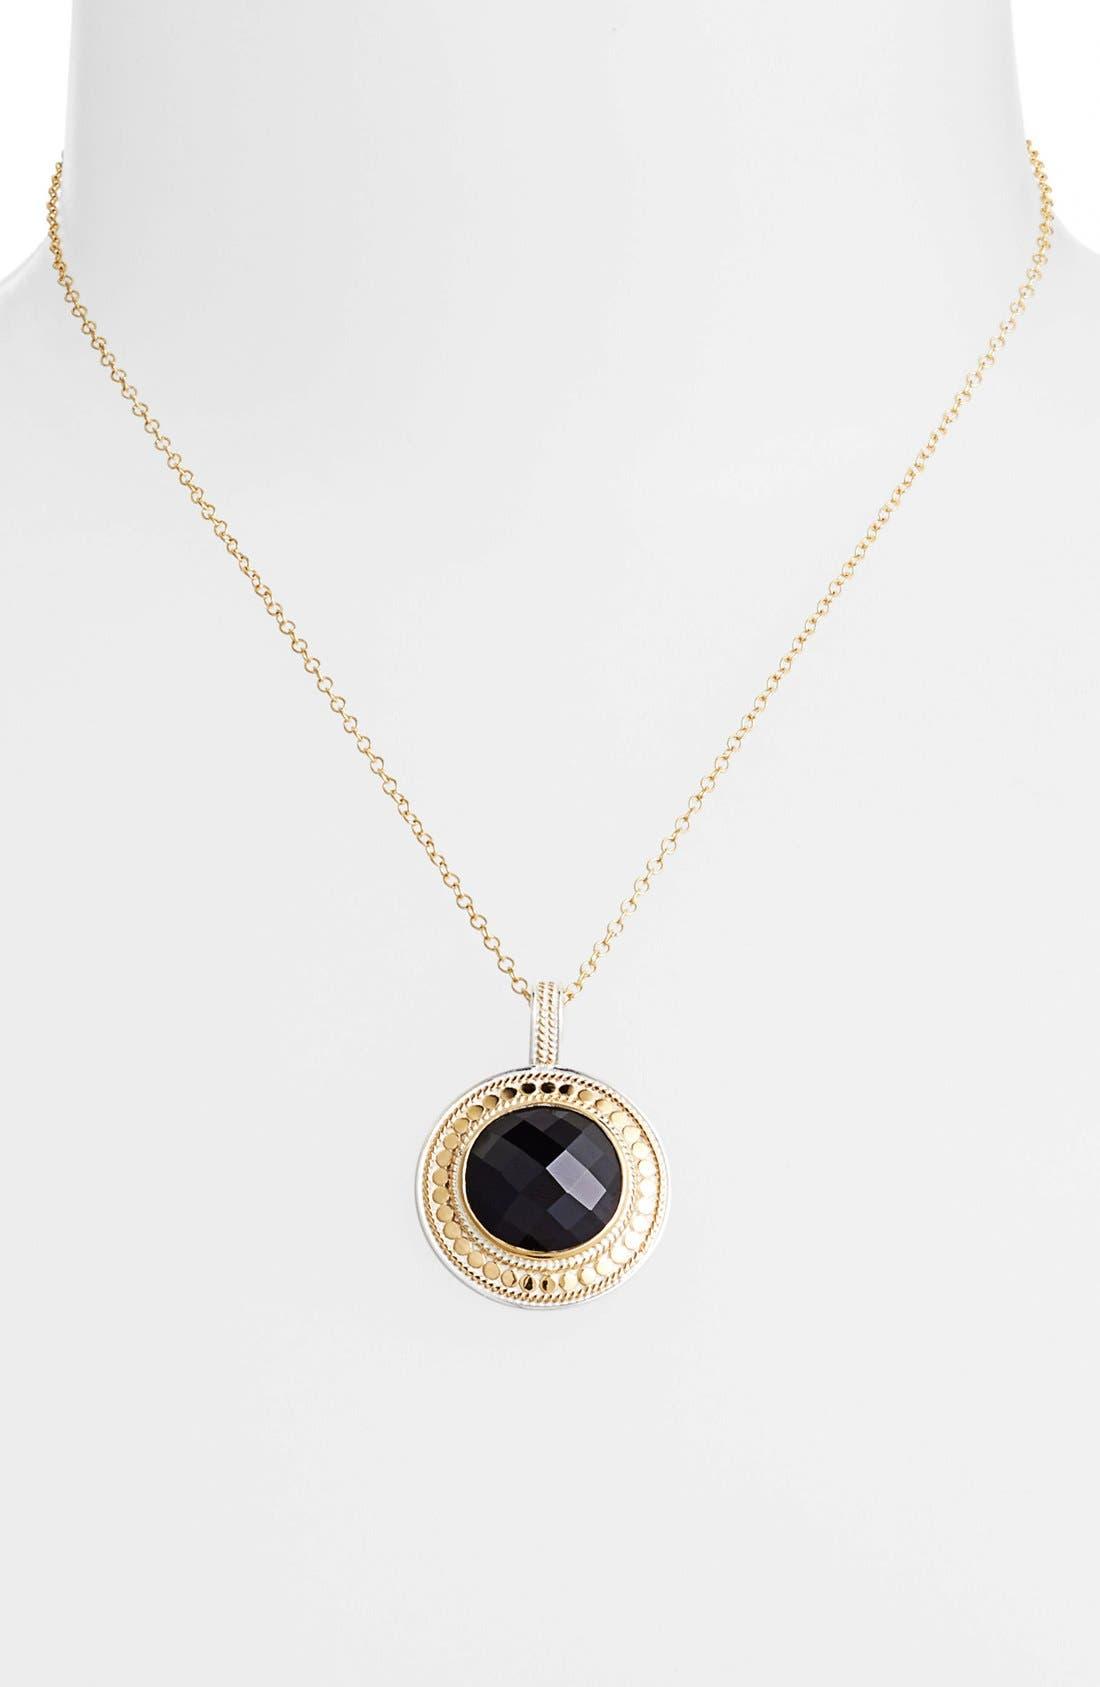 Main Image - Anna Beck 'Gili' Large Pendant Necklace